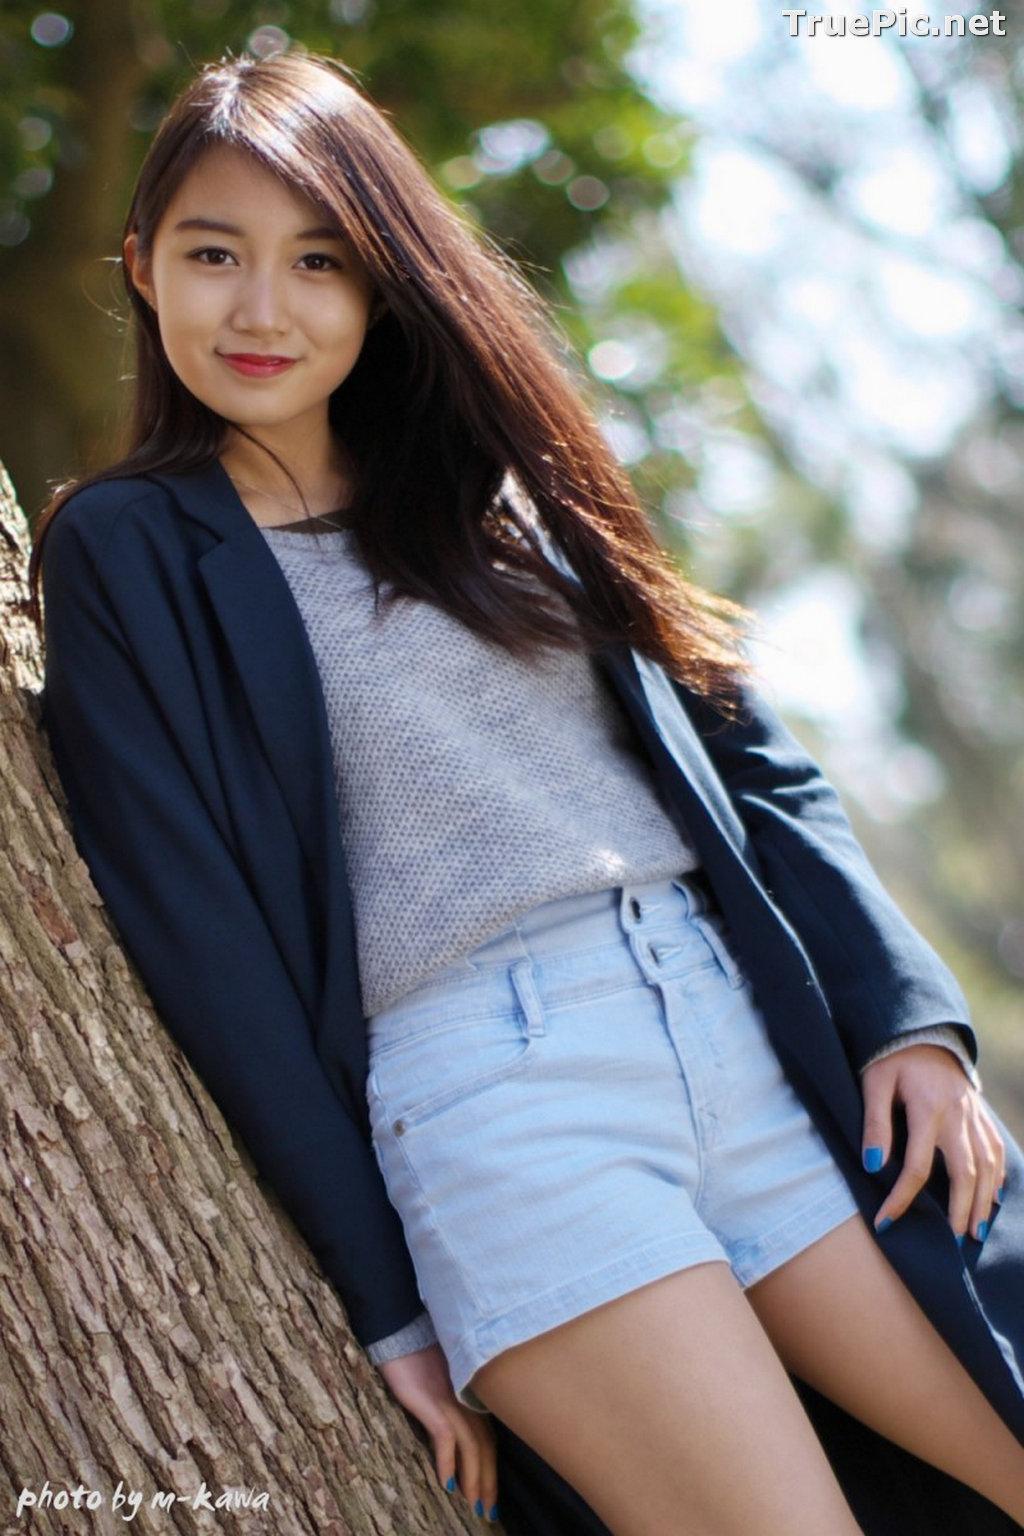 Image Japanese Actress and Model – Hikari Kuroki (黒木ひかり) – Sexy Picture Collection 2021 - TruePic.net - Picture-10